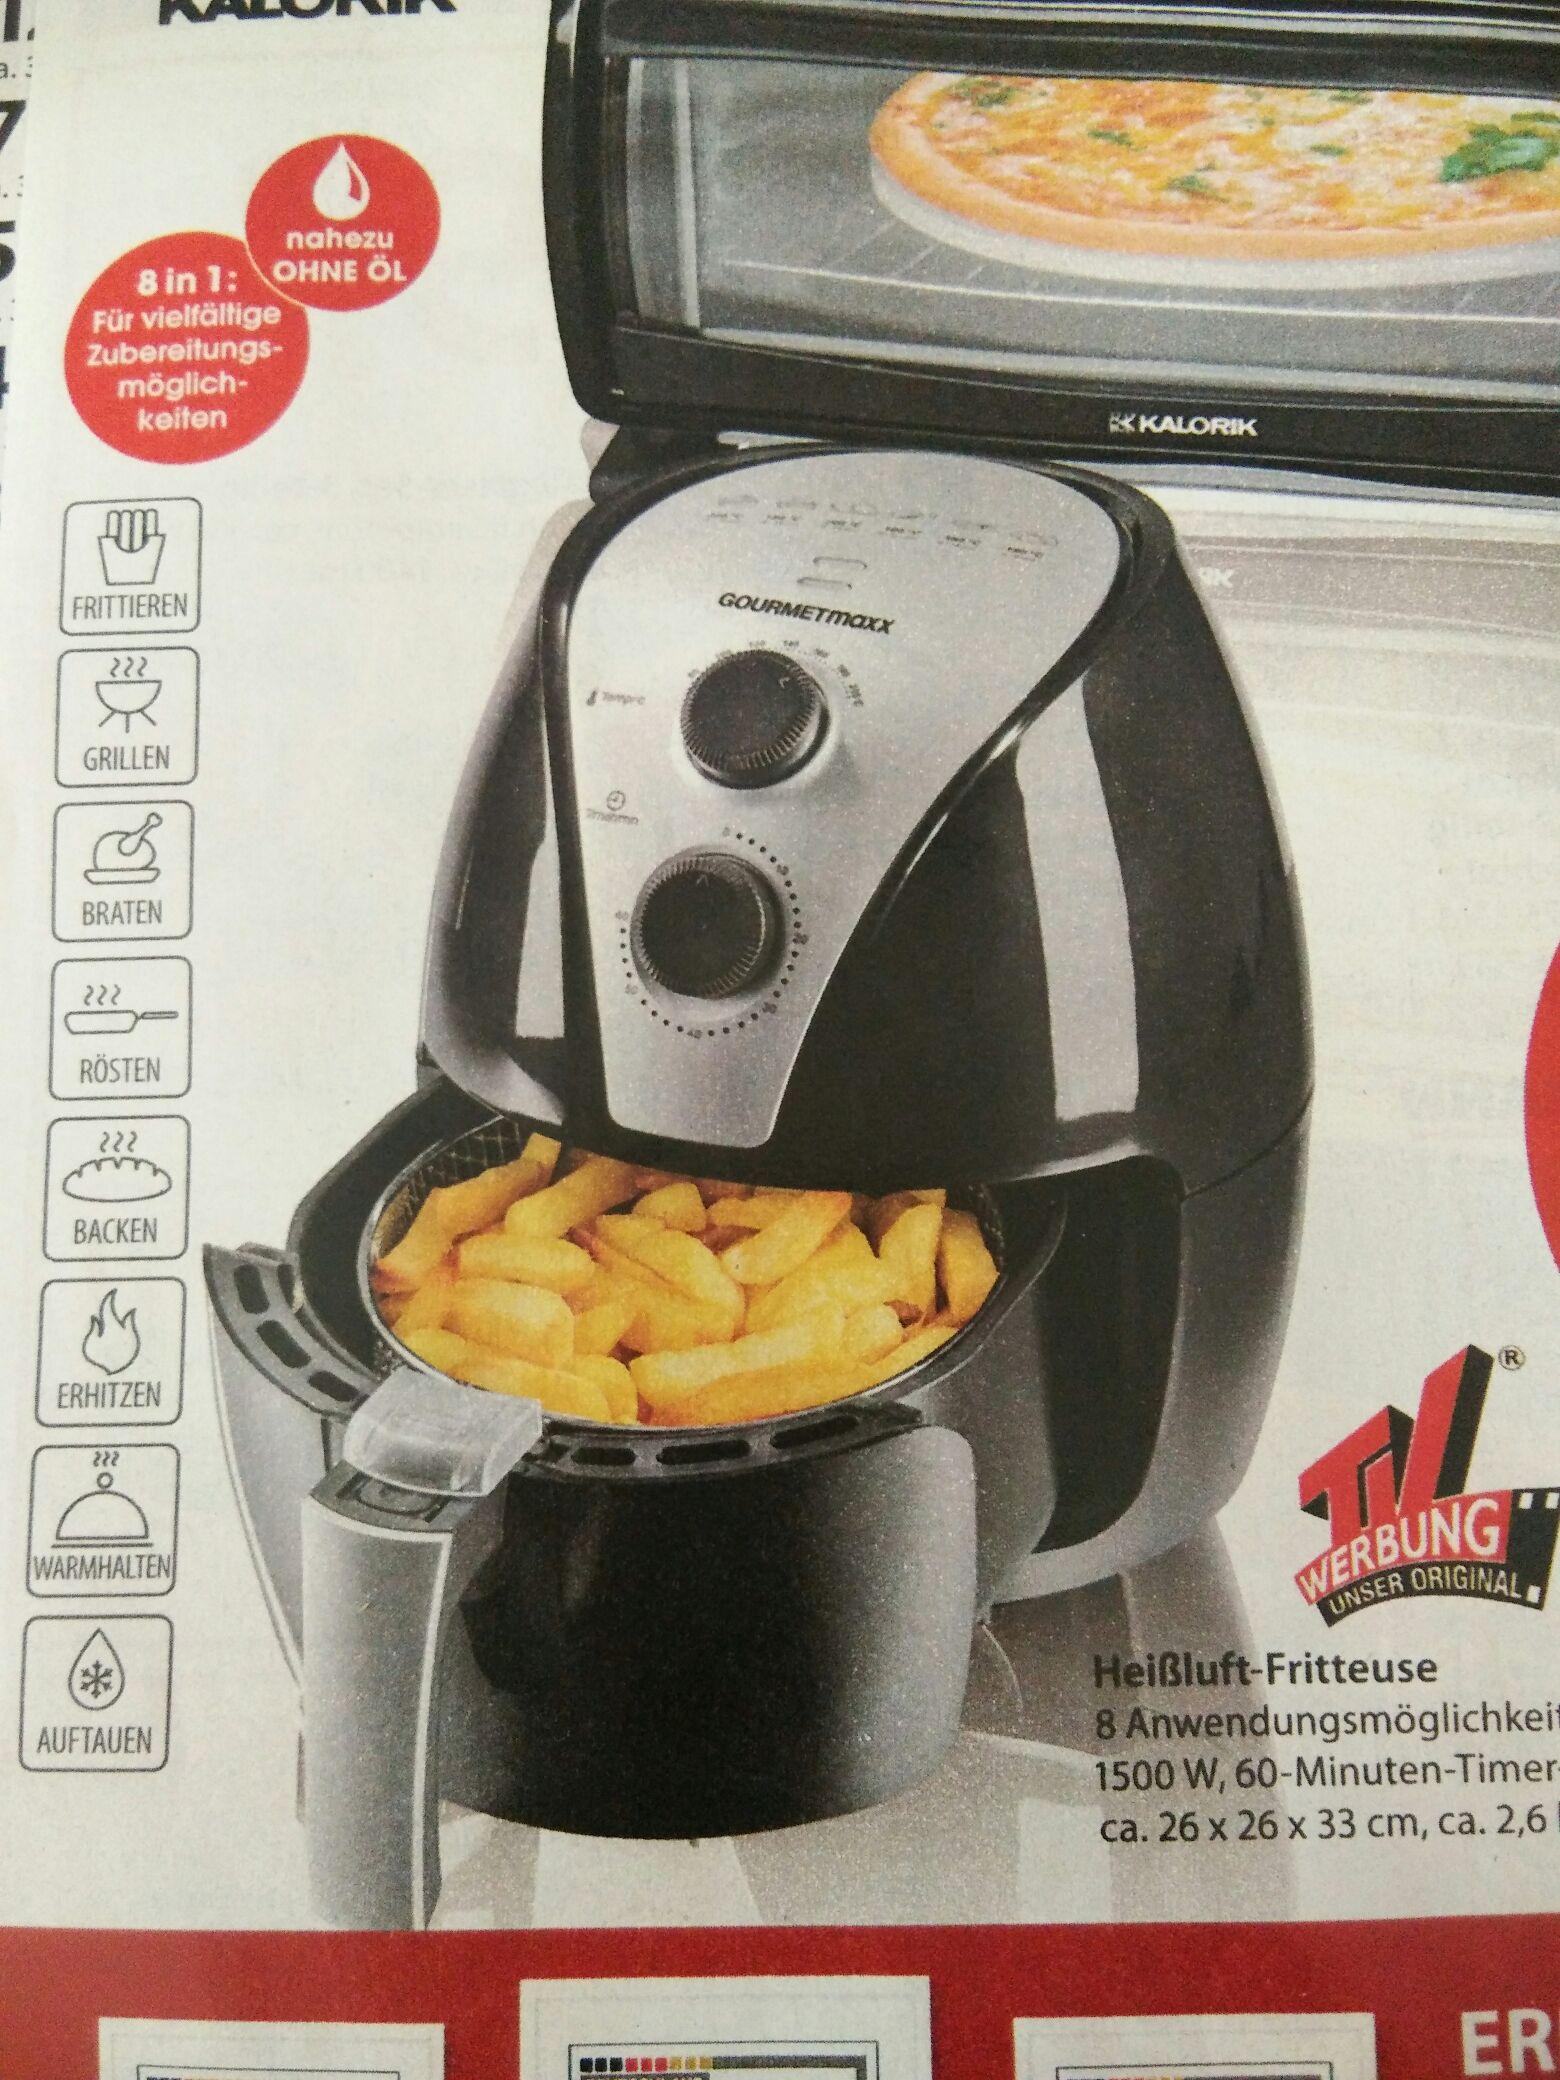 NKD: Gourmetmaxx Heißluft-Fritteuse mit 1500W, 2,6L